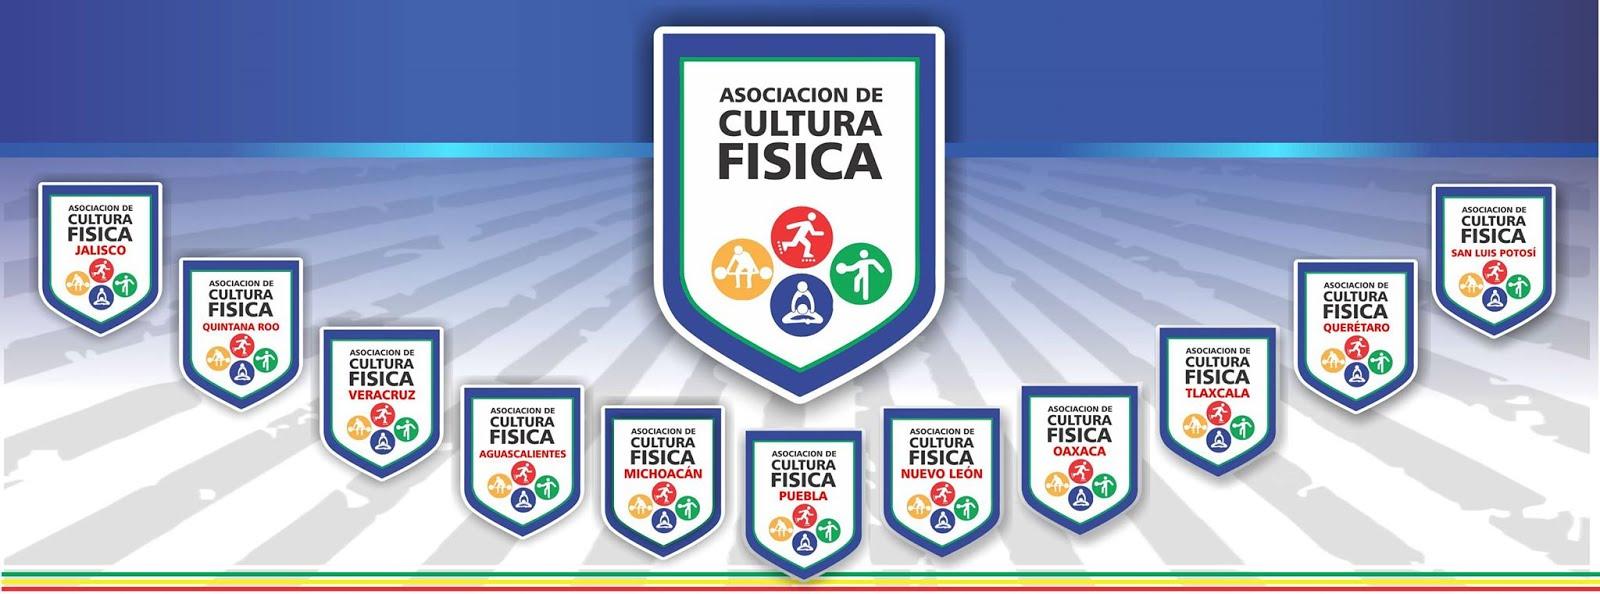 Federación Mexicana de Cultura Física